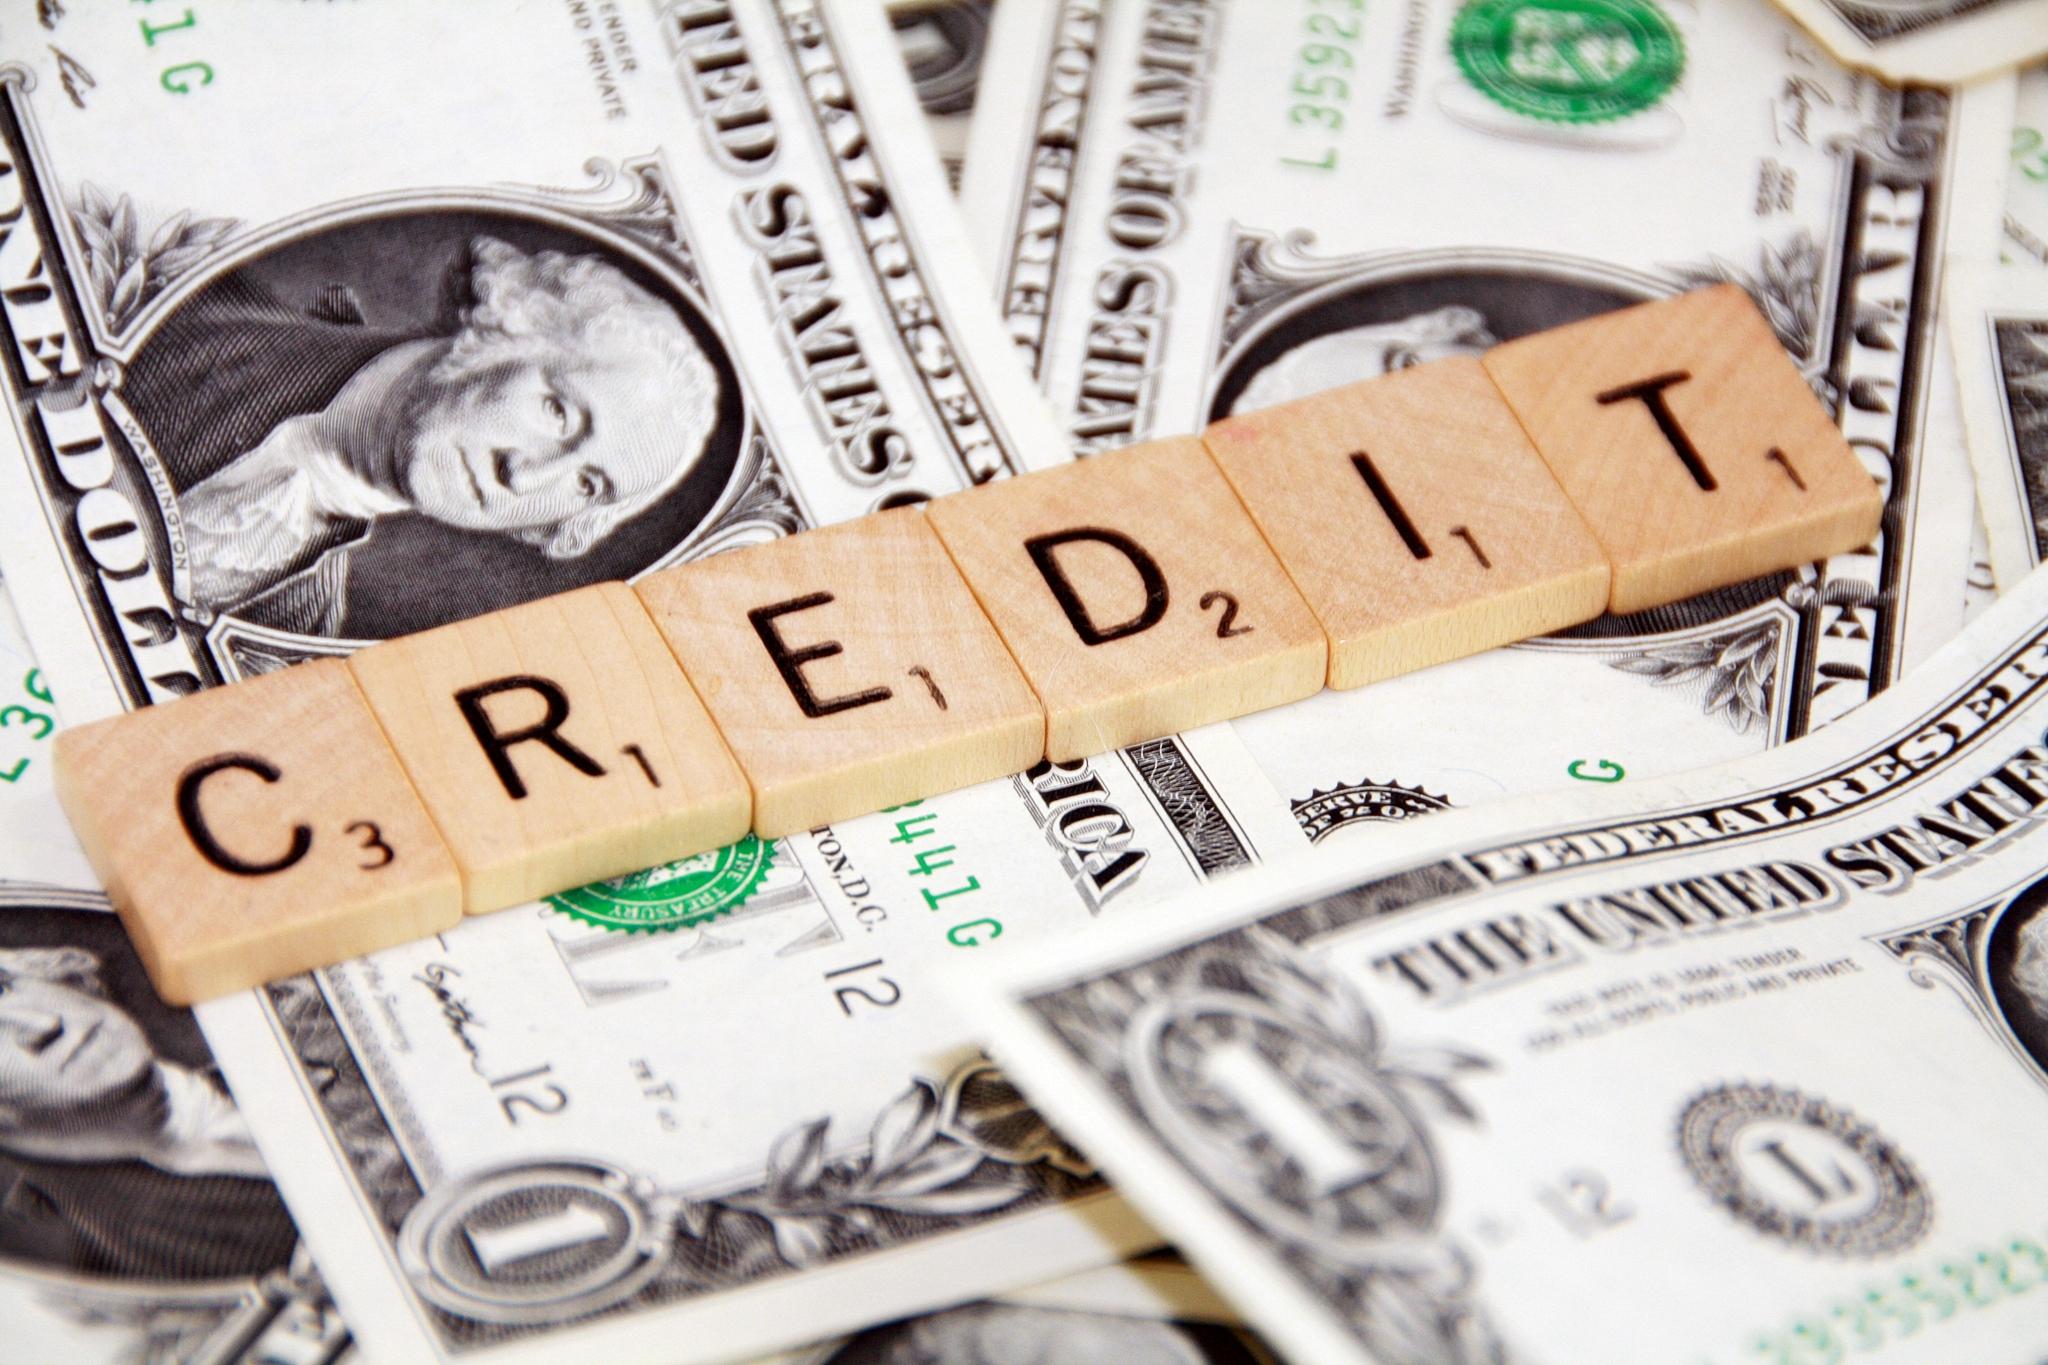 Картинка кредиты и займы